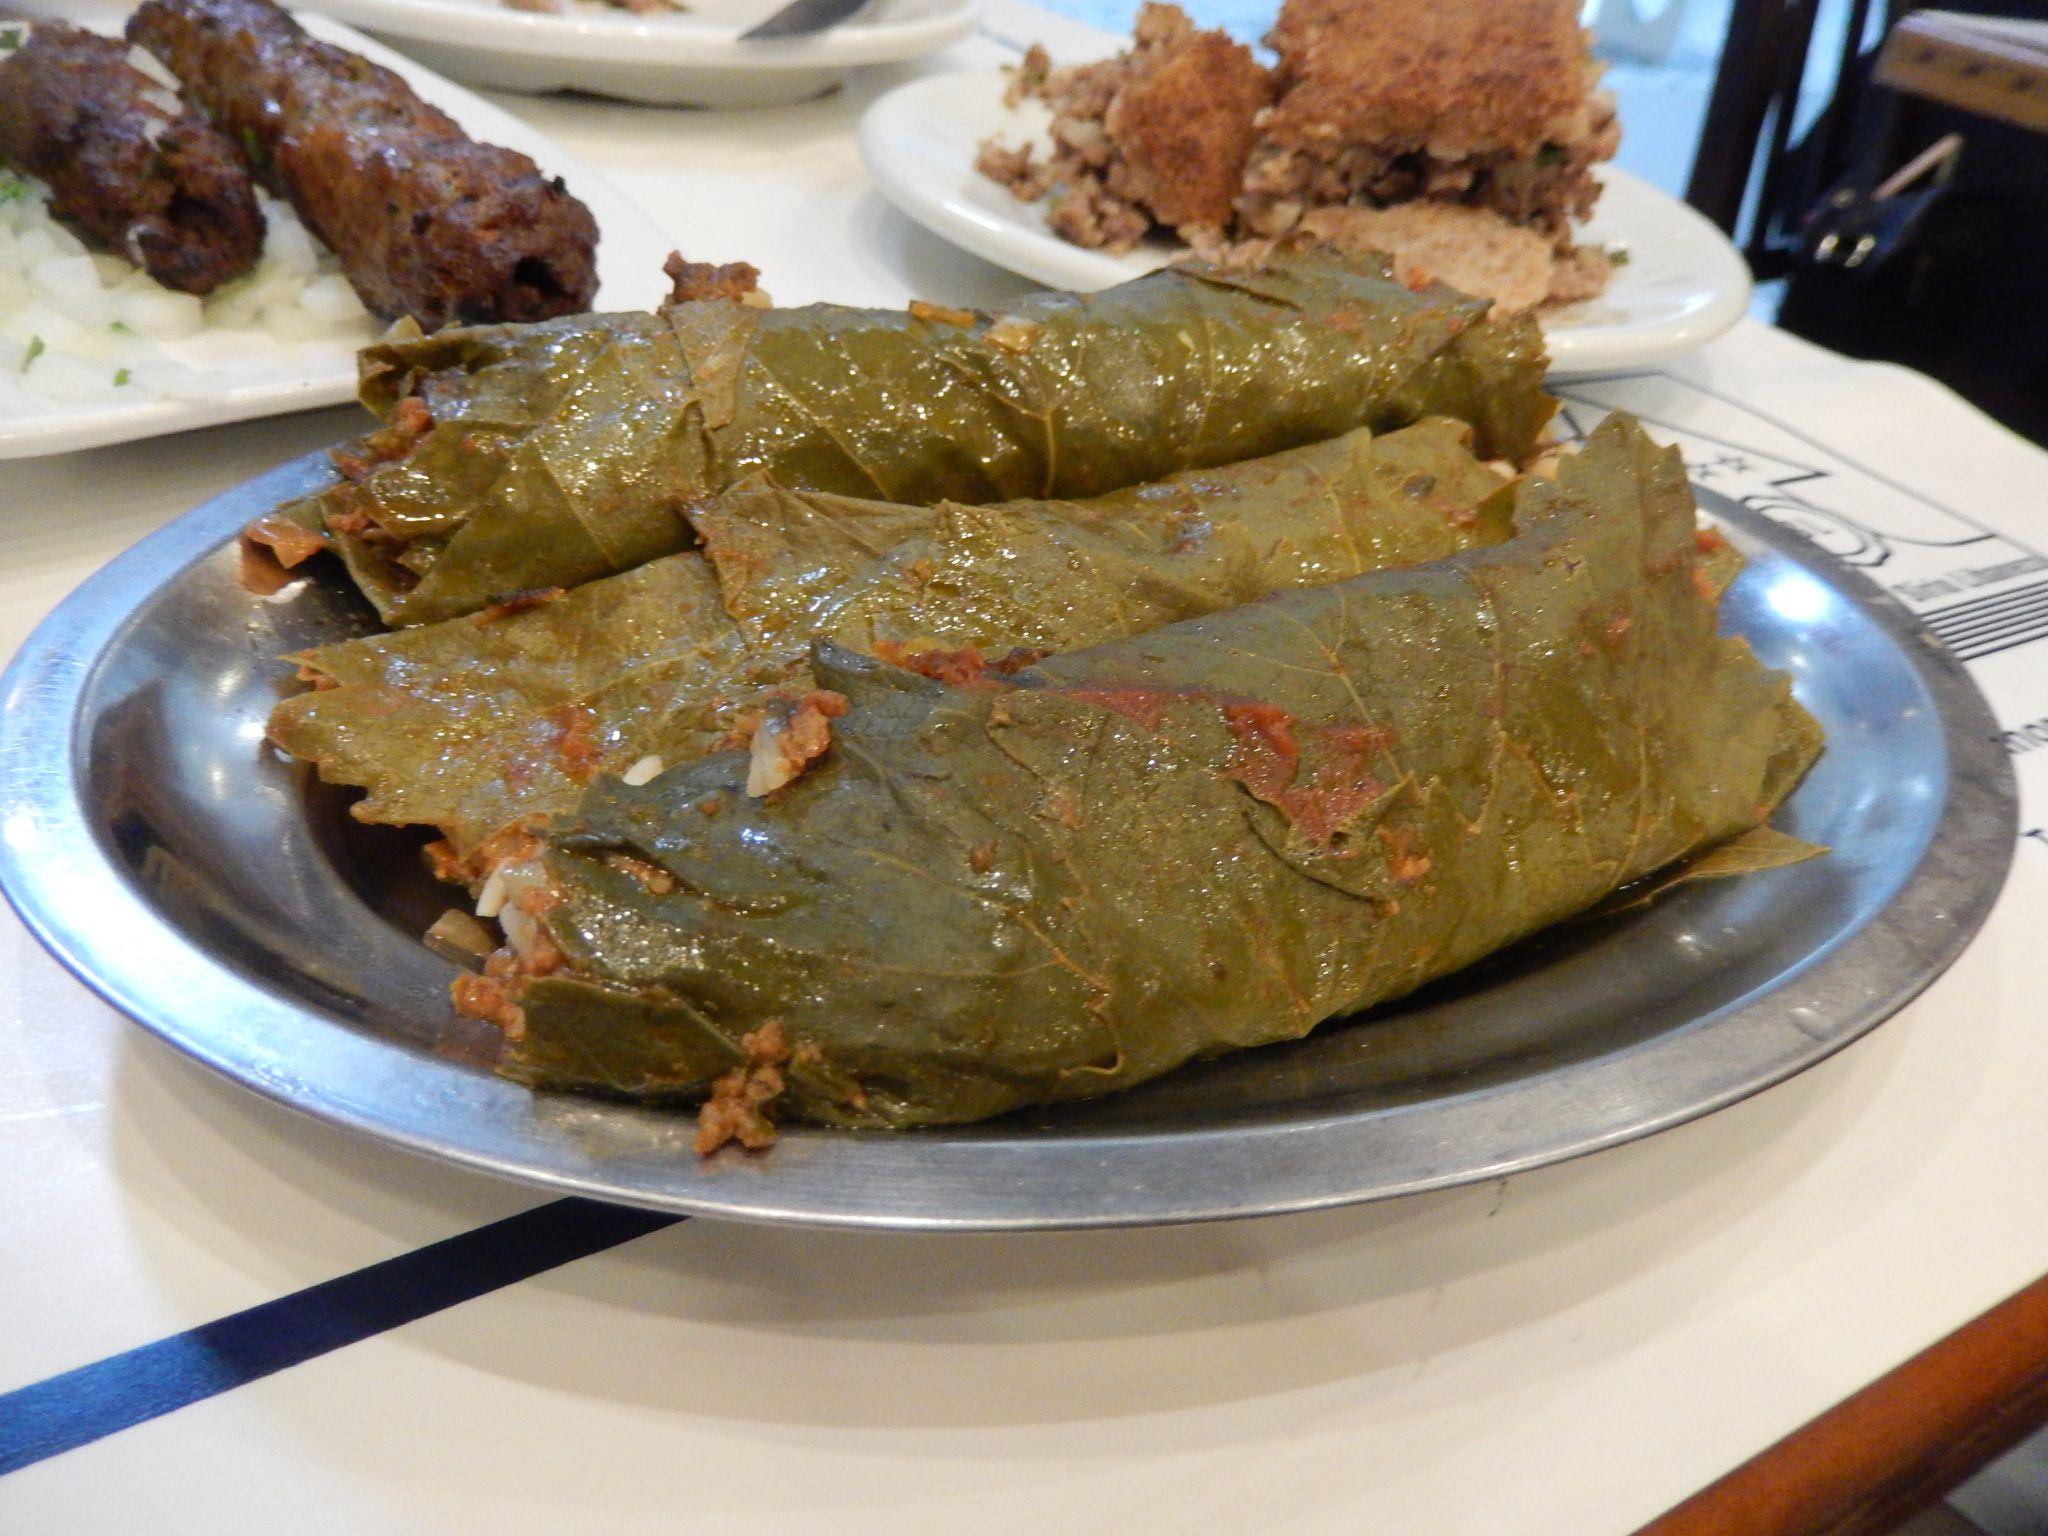 Arab Food in Largo do Machado, Rio de Janeiro